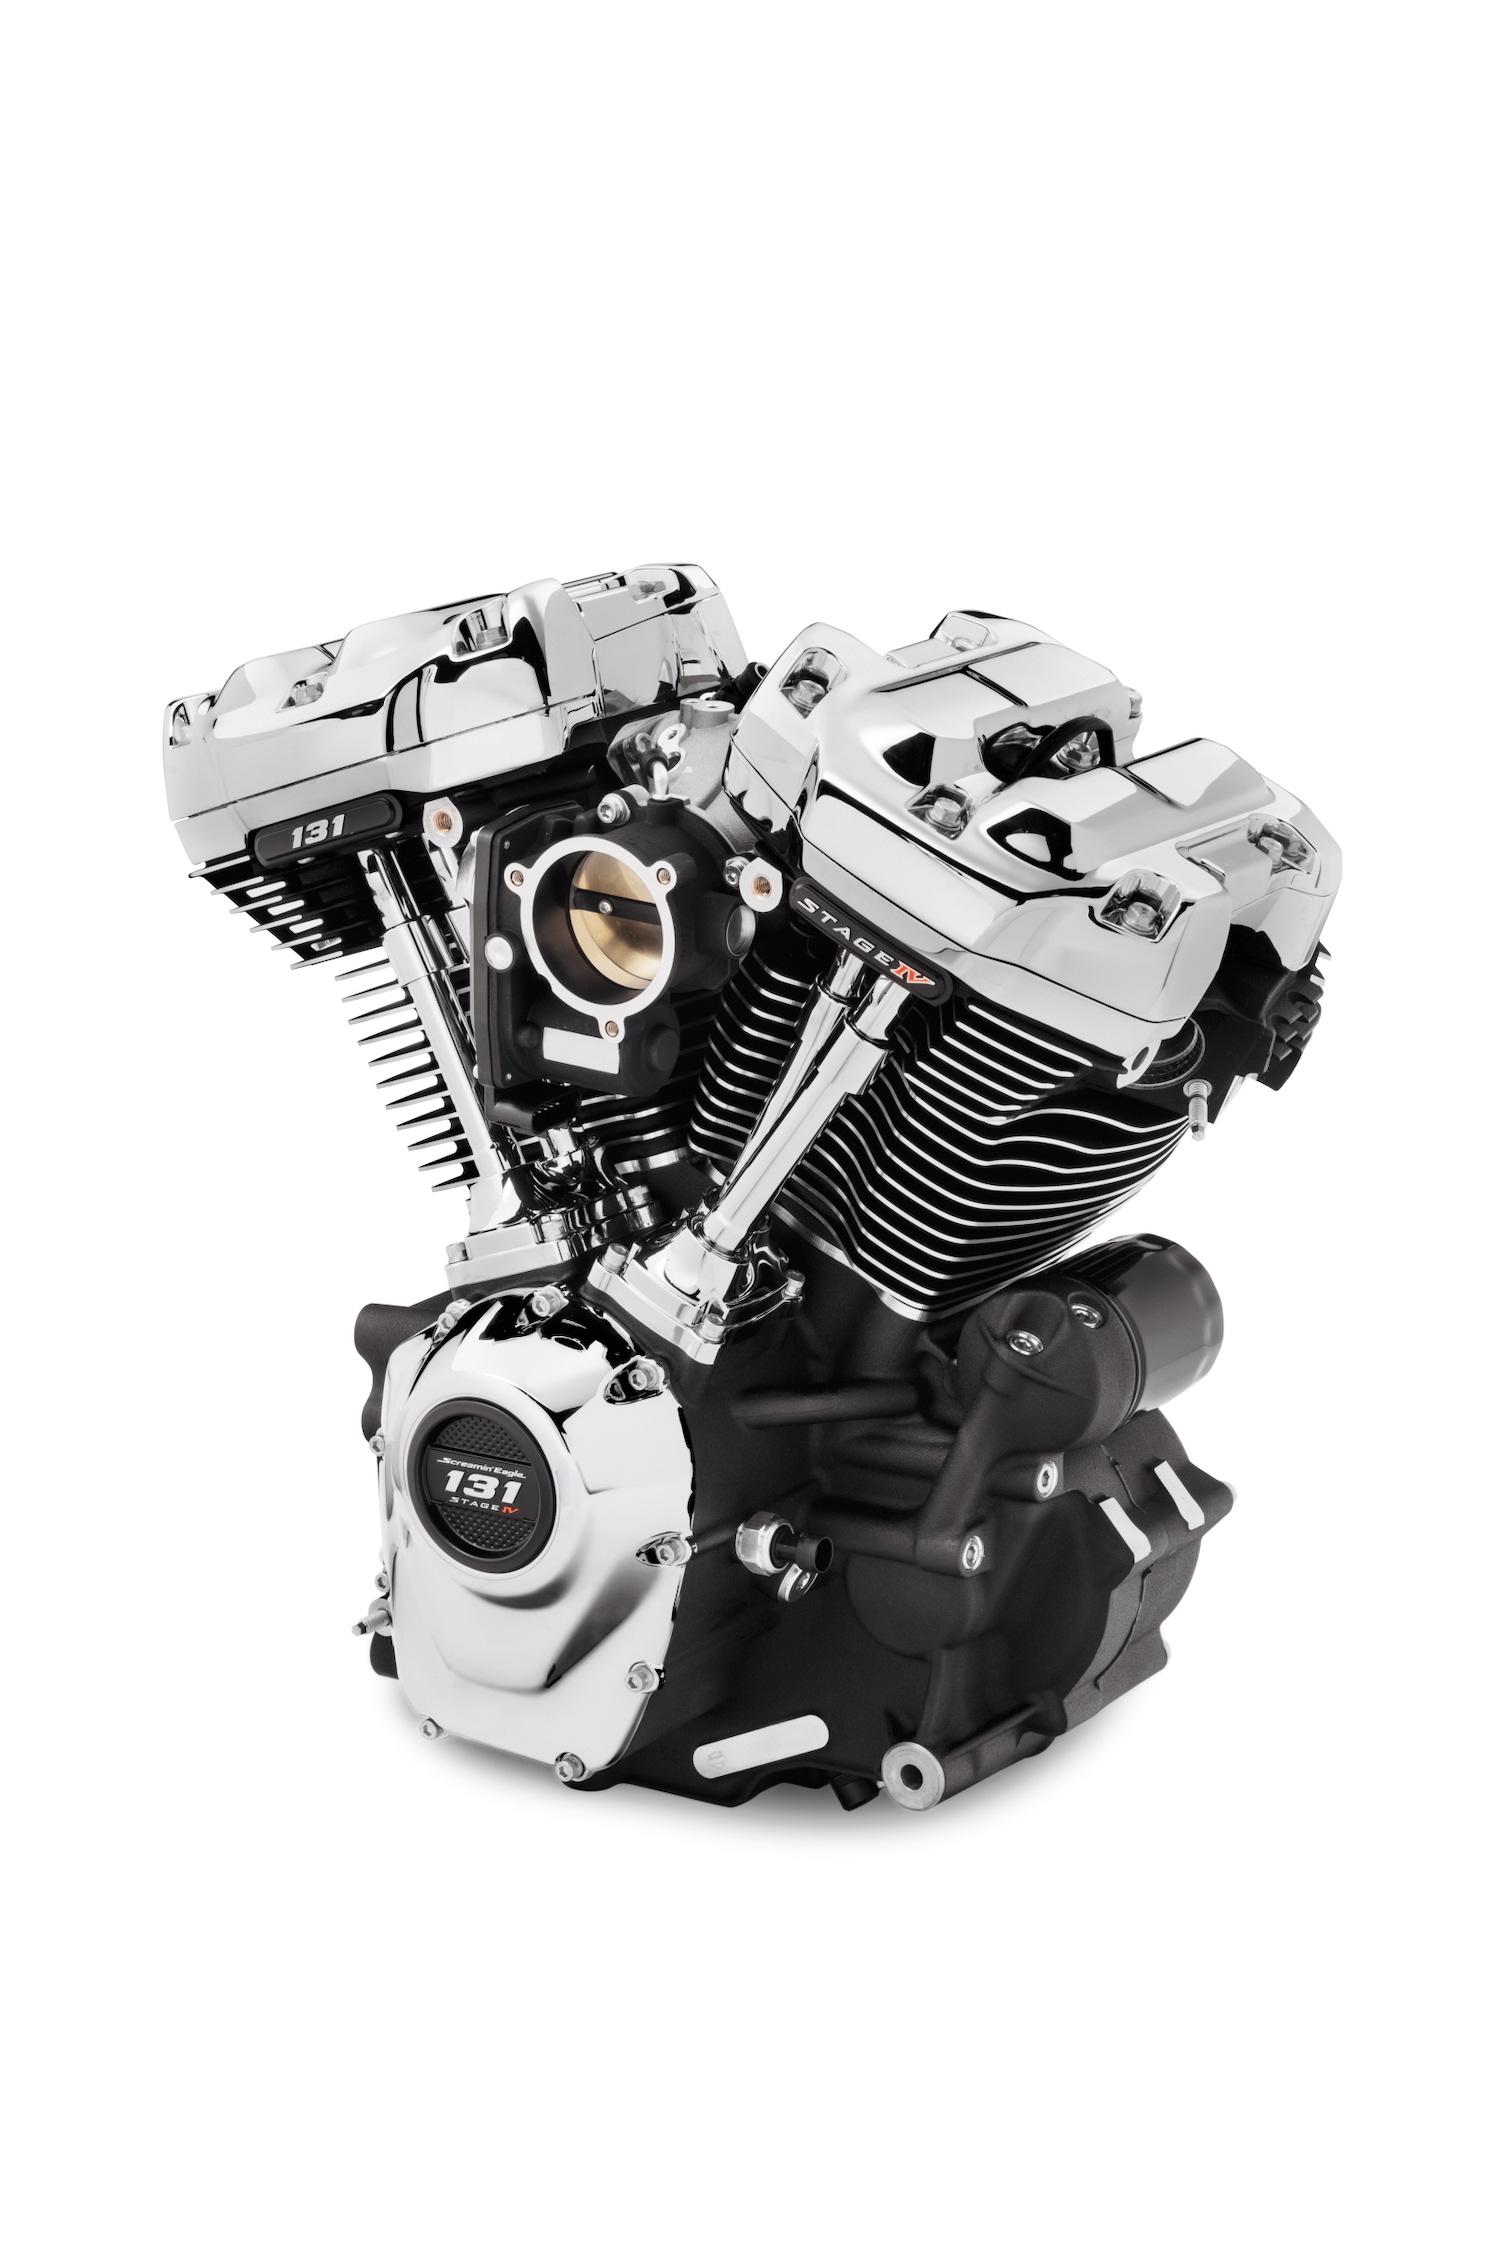 new screamin eagle 131 crate engine